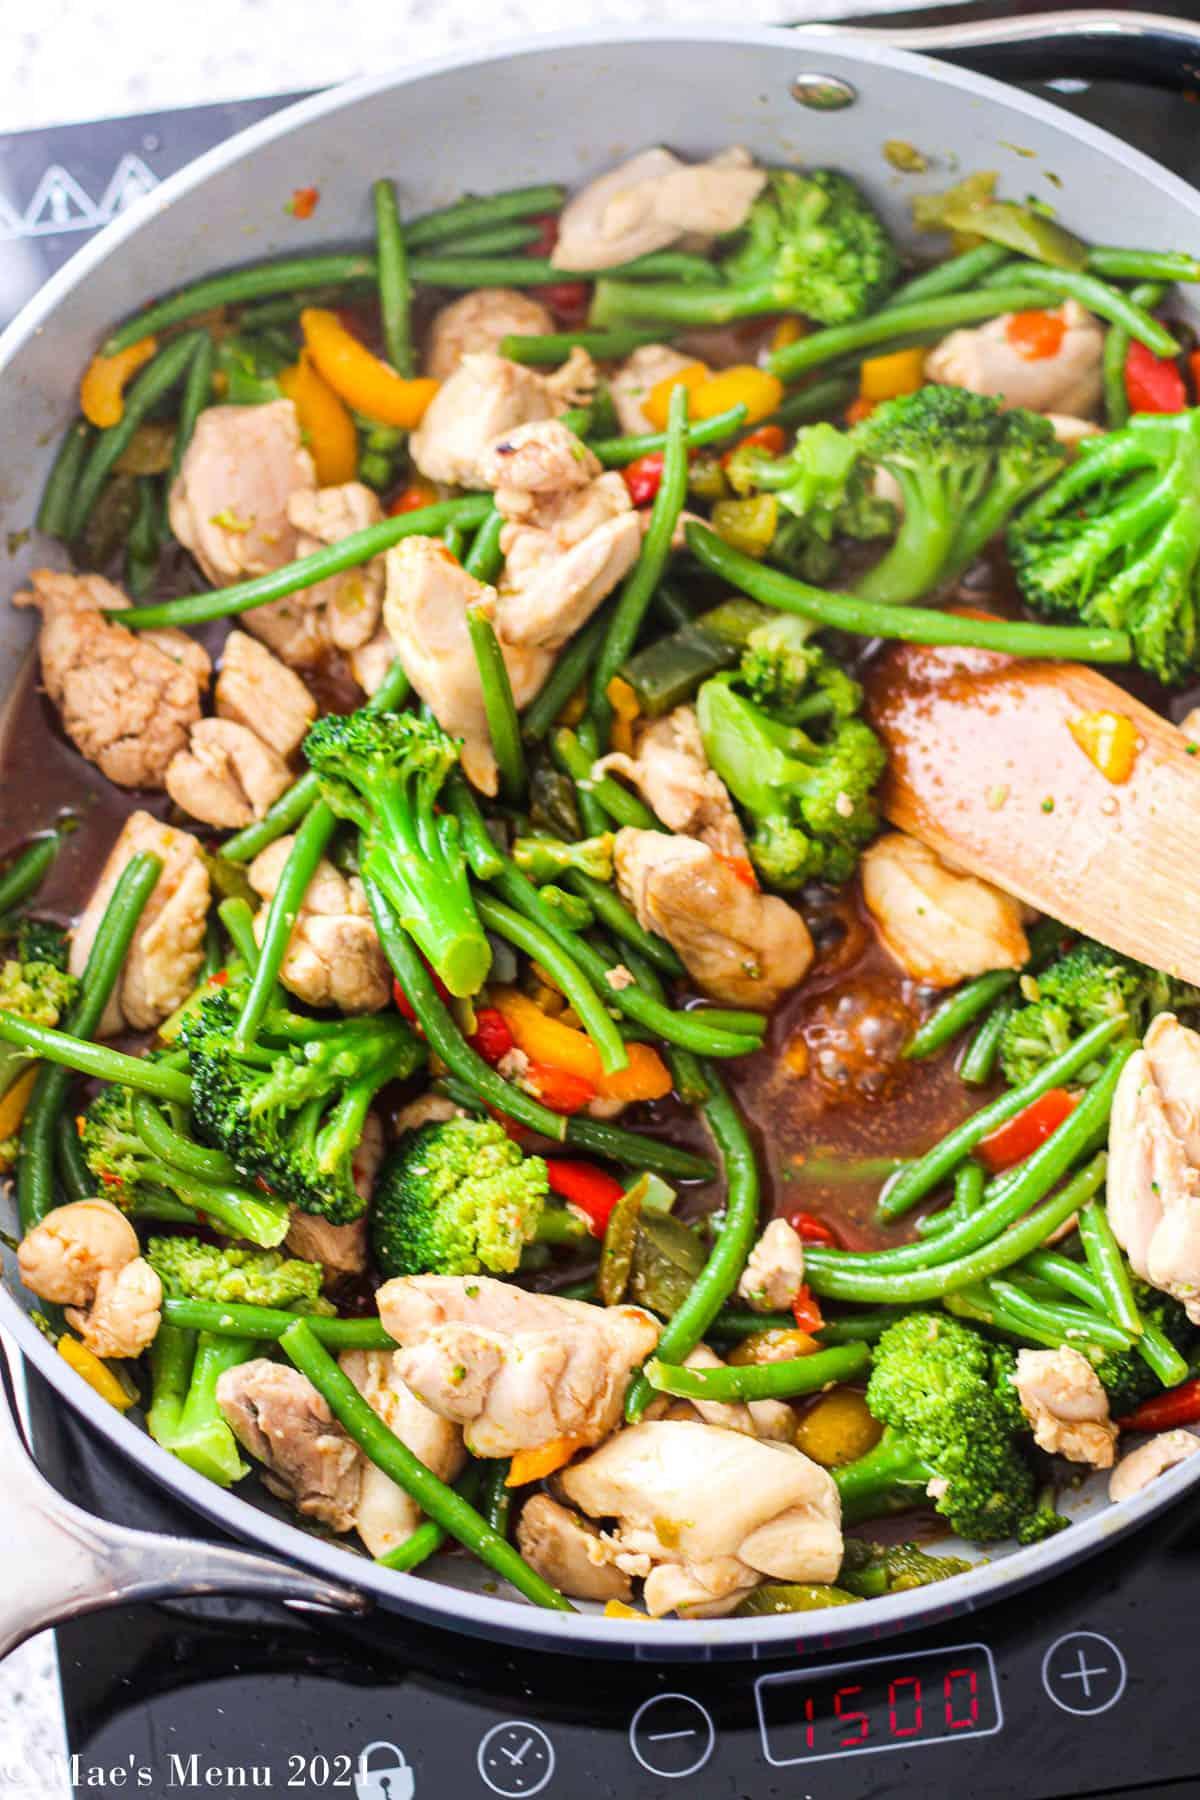 An overhead shot of a pan of chicken and frozen vegetable stir-fry